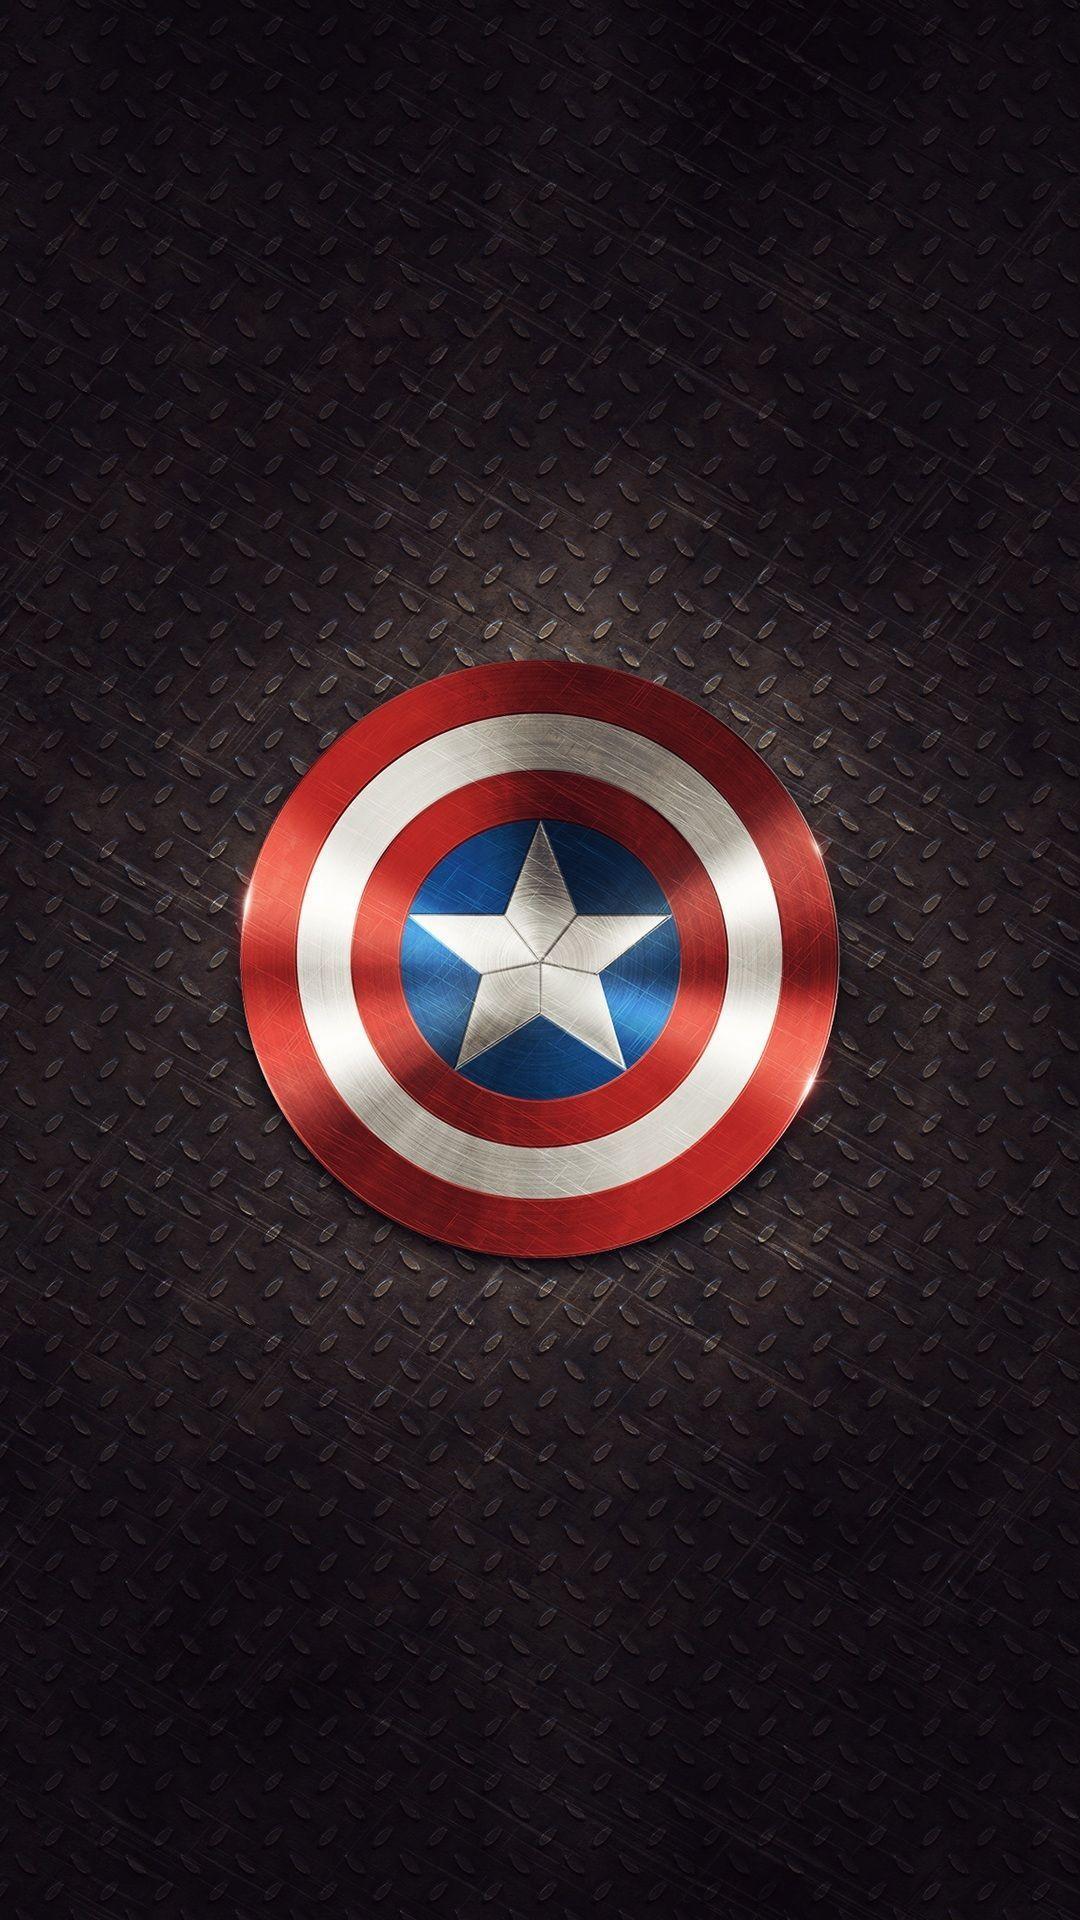 Superhero Logo Hd Phone Wallpapers Top Free Superhero Logo